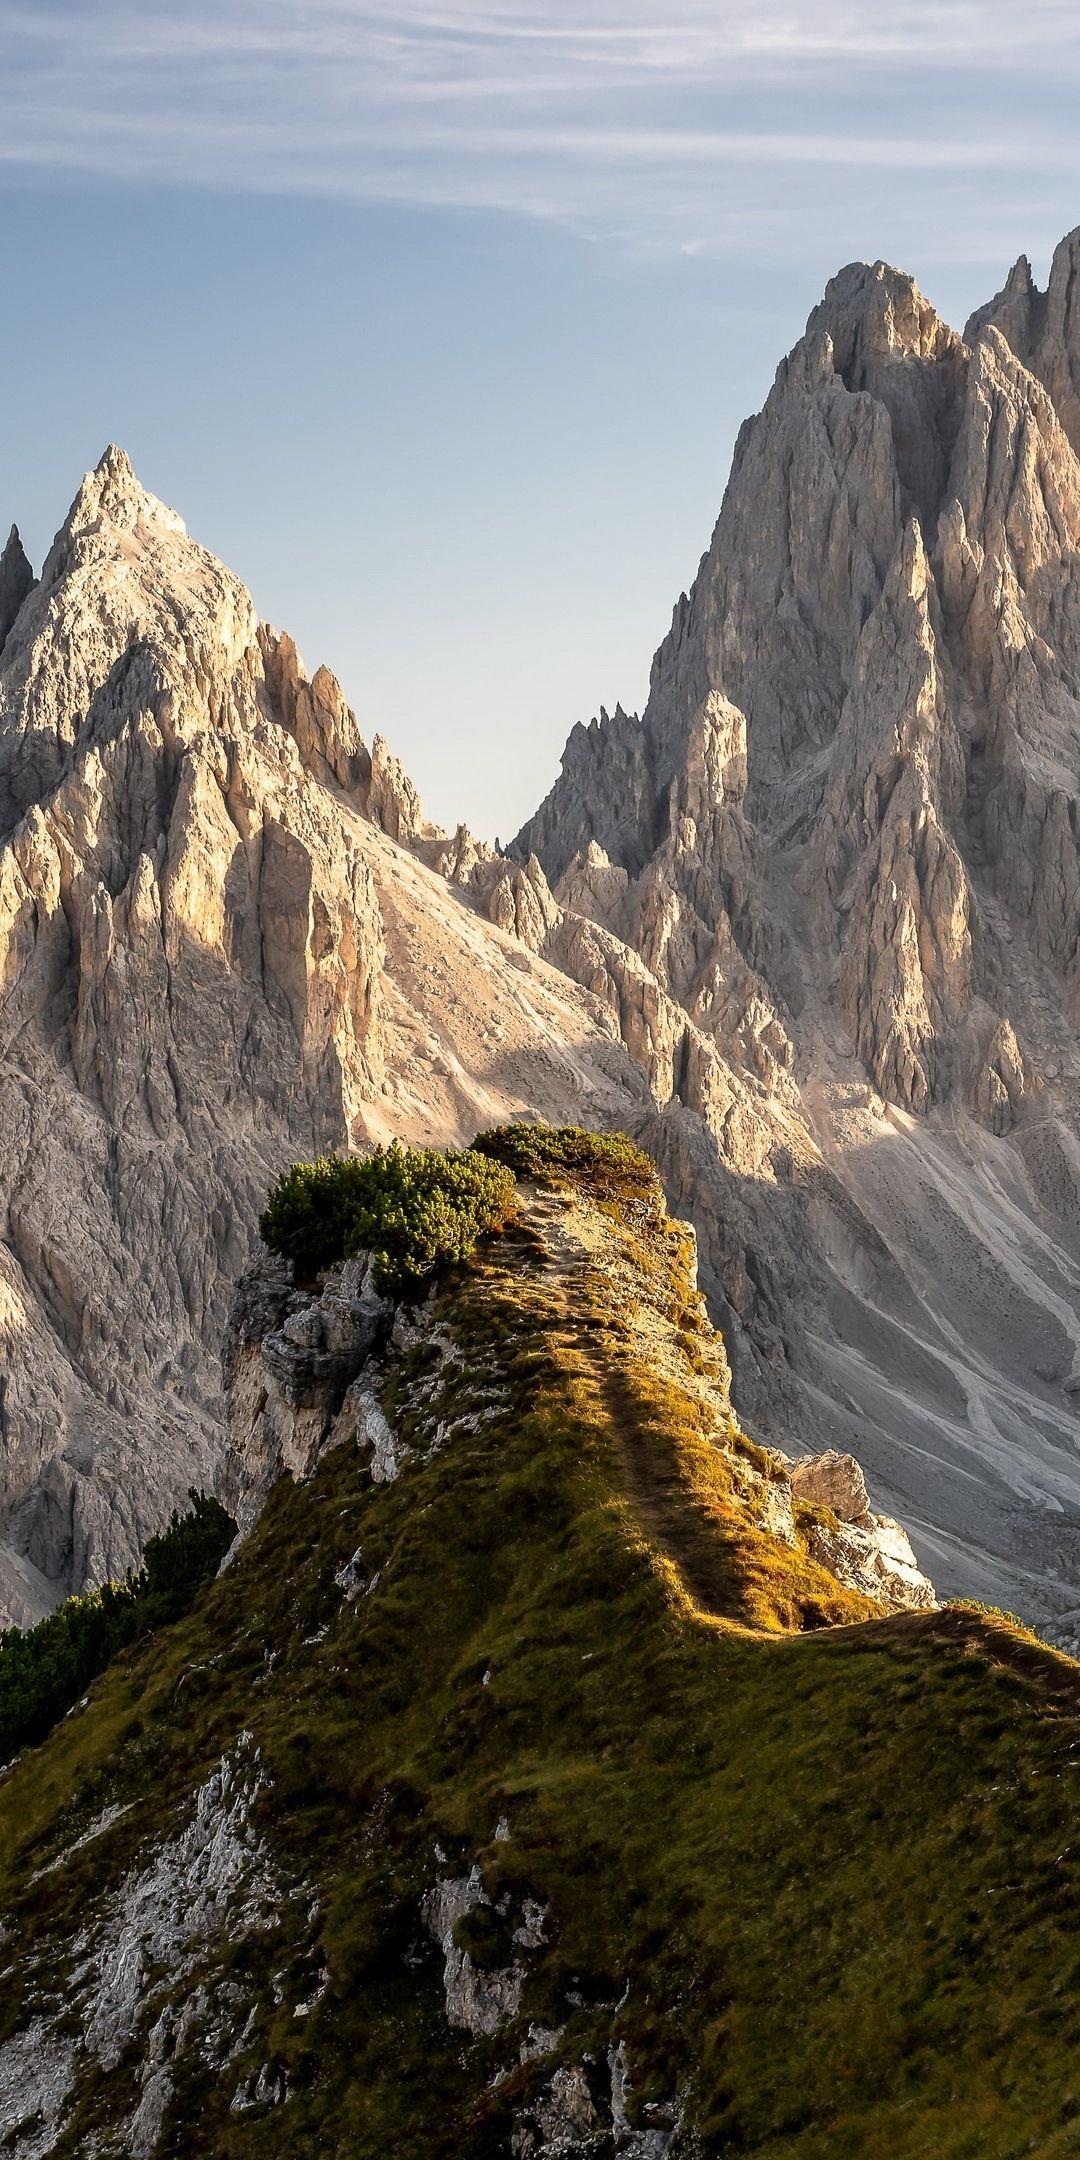 1080x2160 Nature Dolomites Mountains Italy Wallpaper Scenery Wallpaper Iphone Wallpaper Sky Ocean Wallpaper